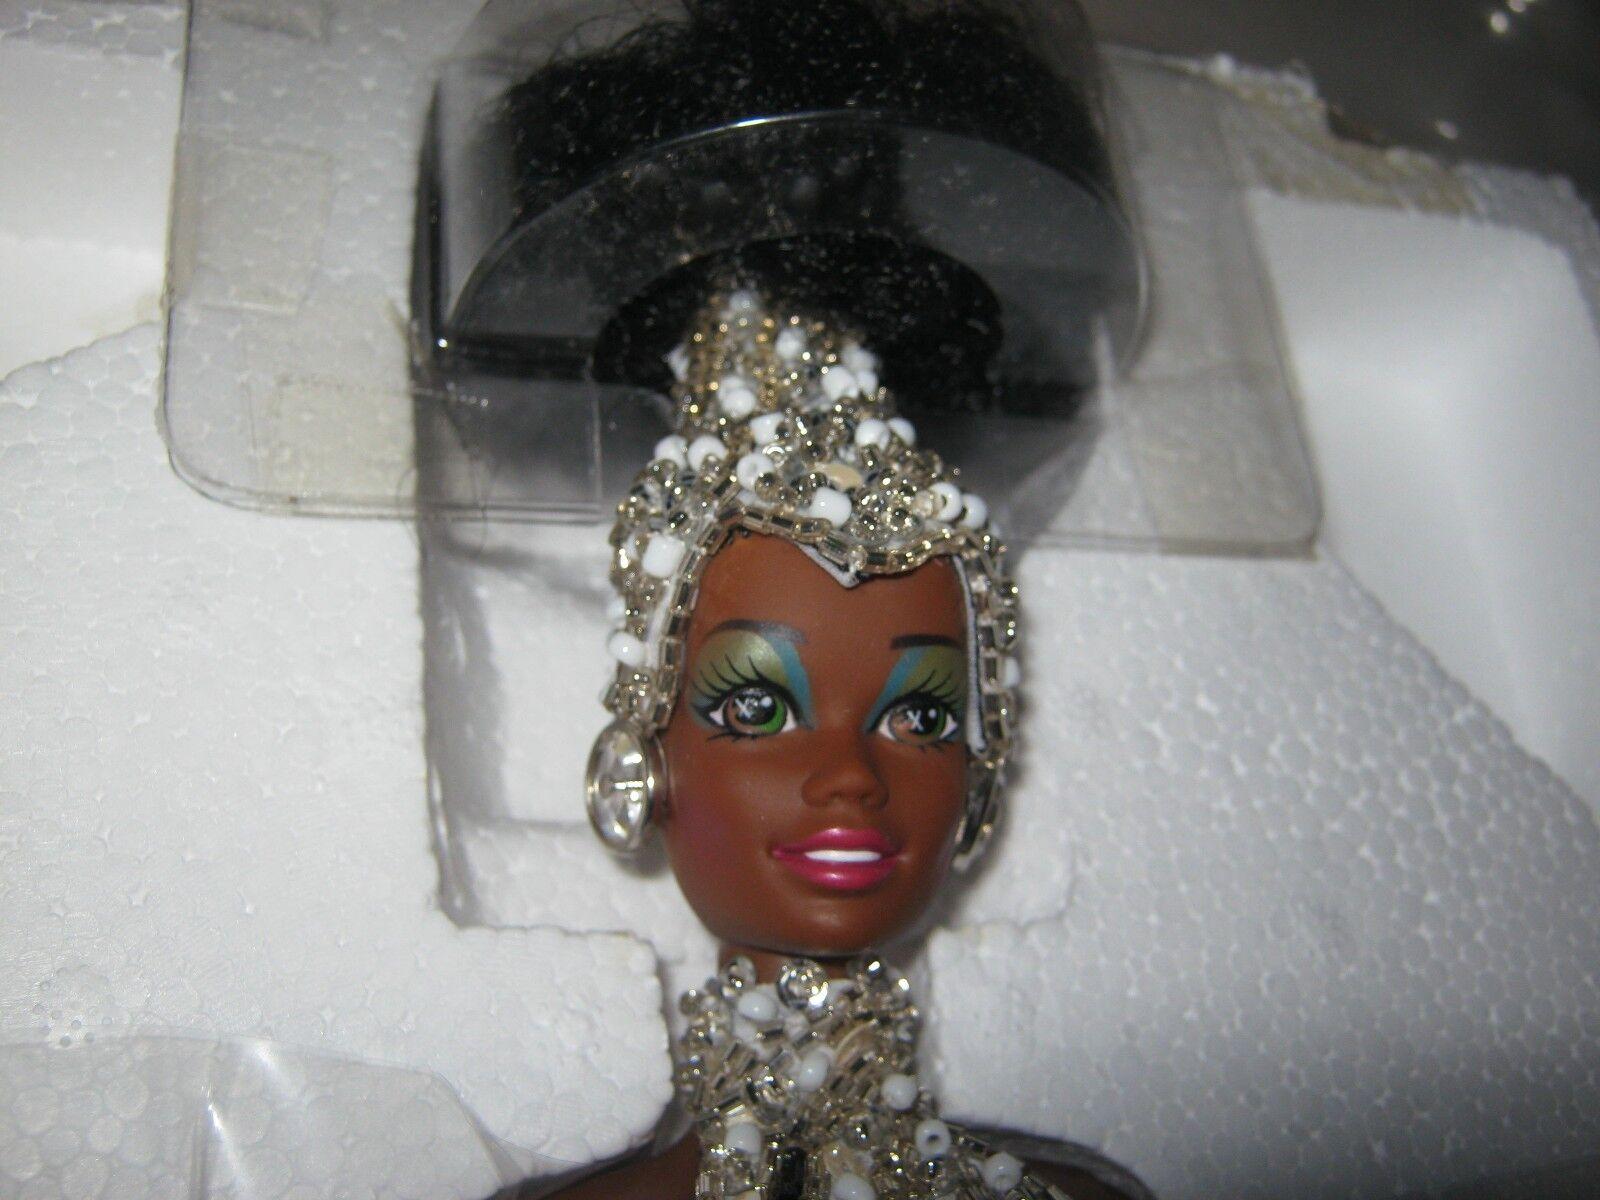 Bob Mackie Starlight esplendor Barbie